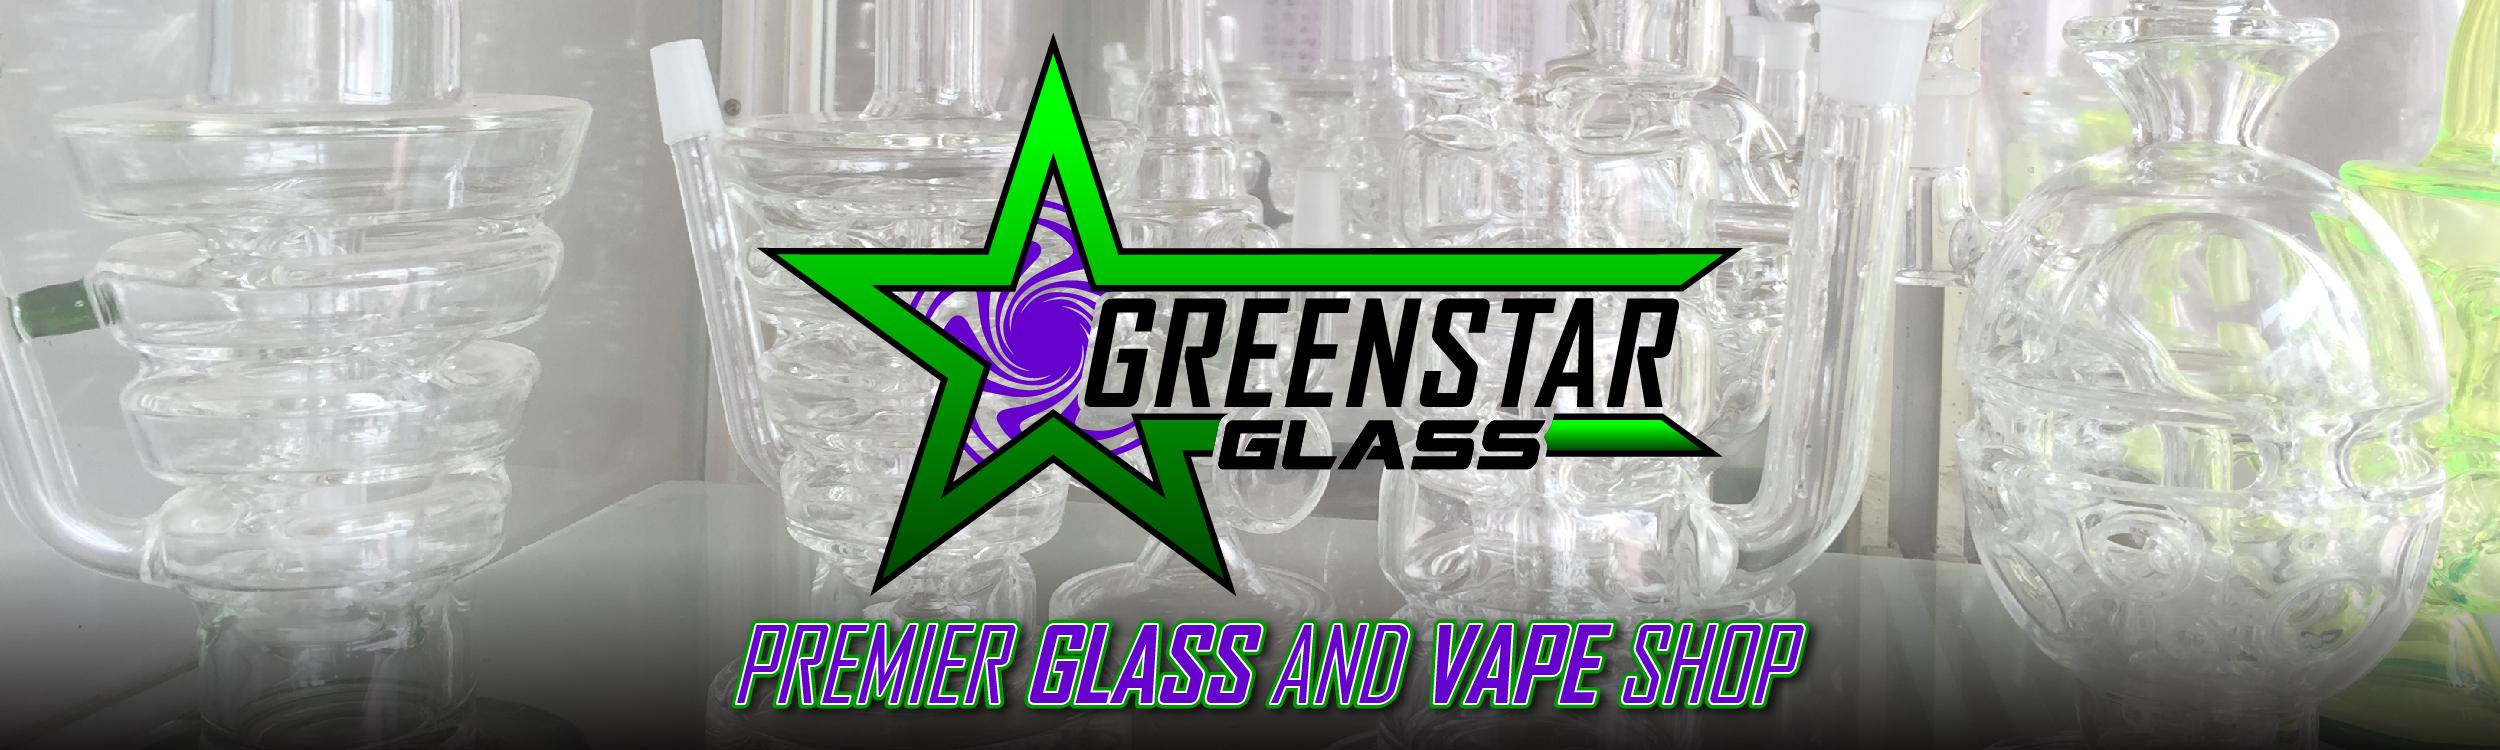 Greenstar Glass logo banner